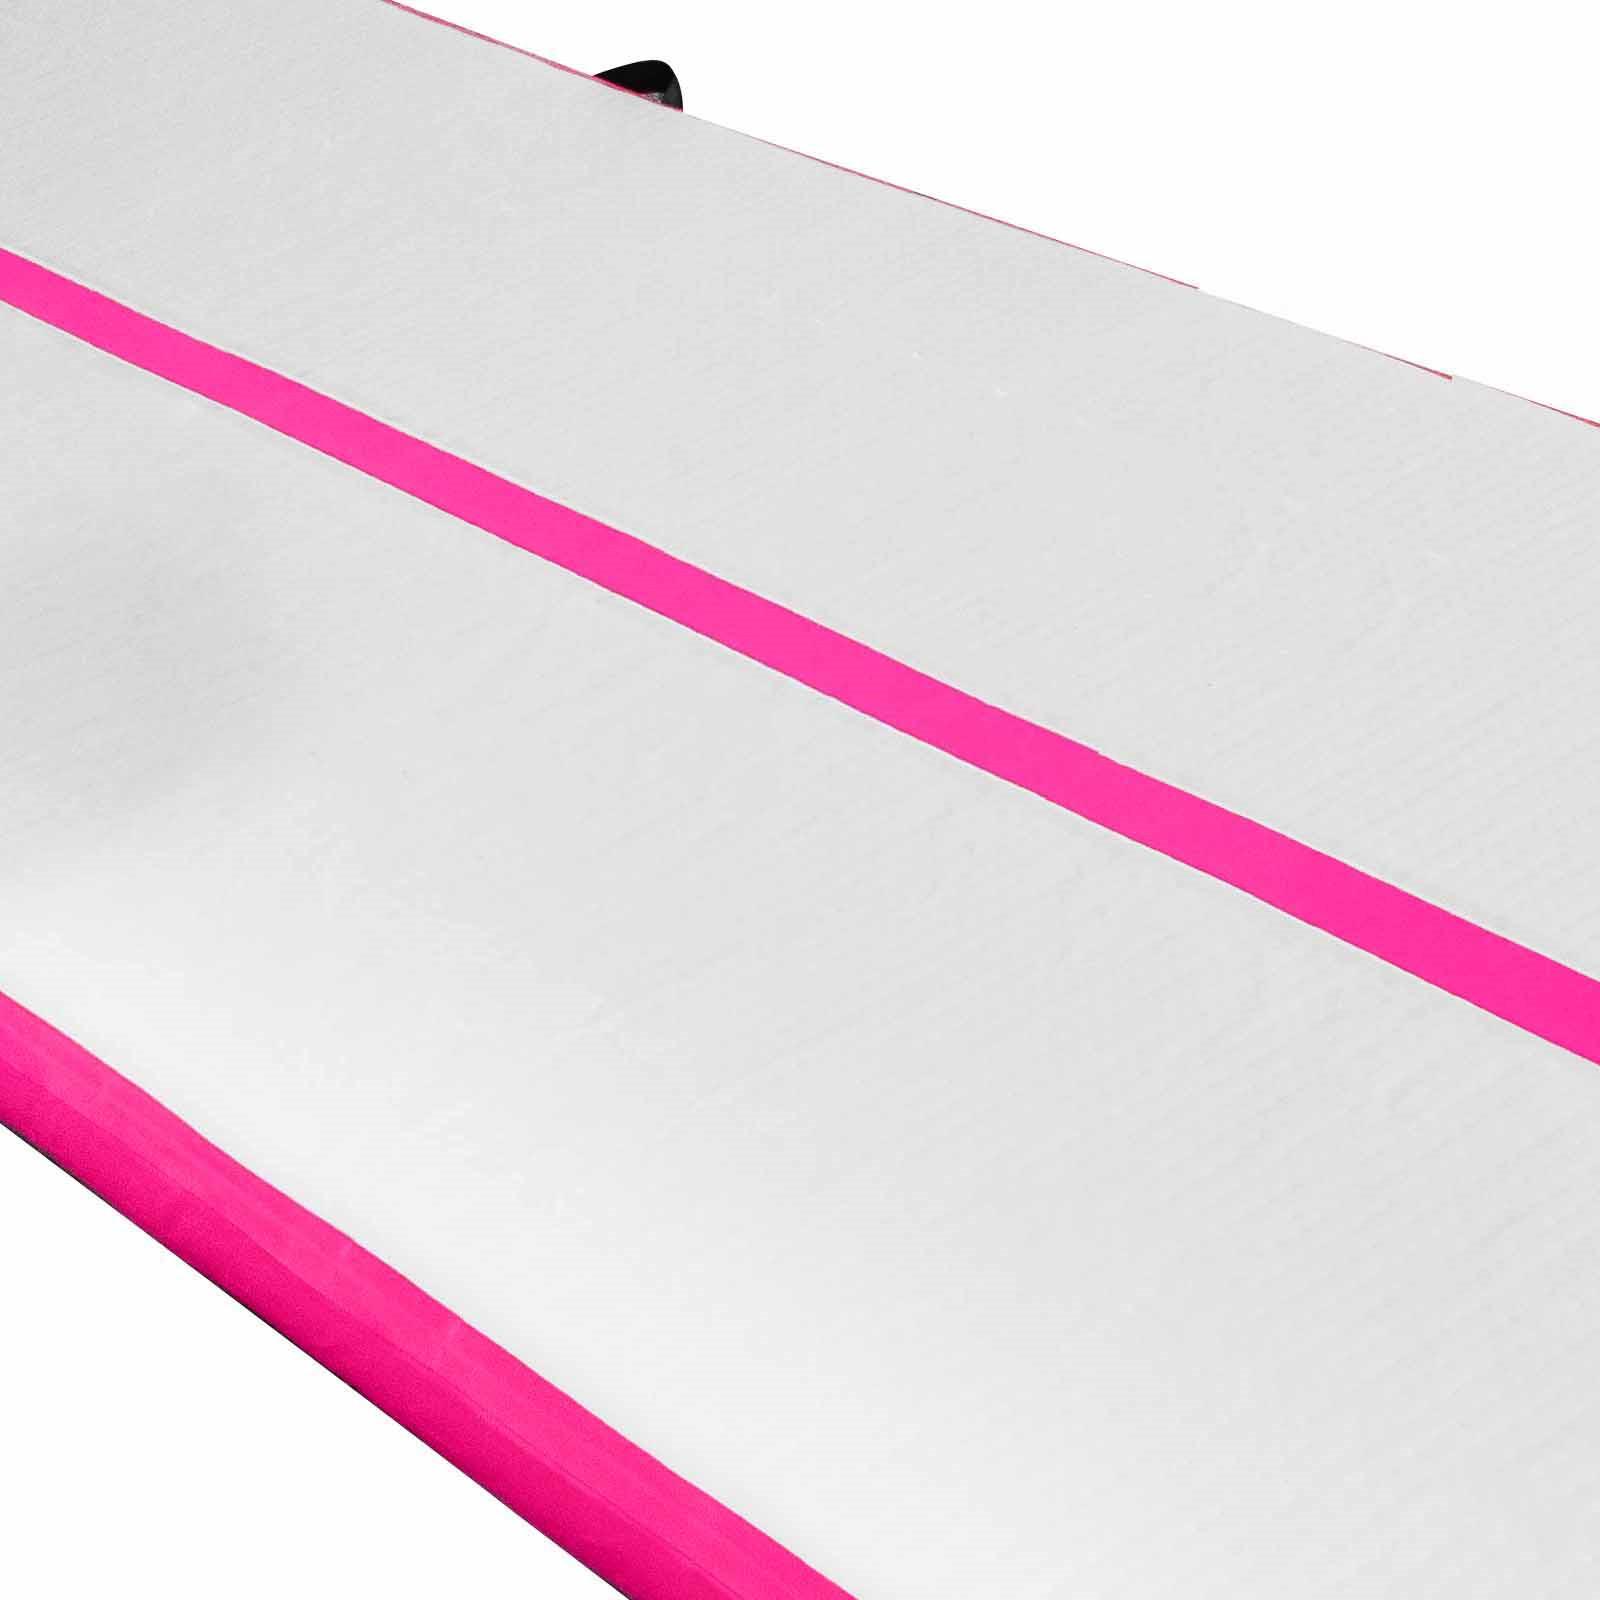 Air-Track-10x3FT-Trumbling-Airtrack-Gymnastics-Yoga-Floor-Mat-Training-Pad-Home thumbnail 43